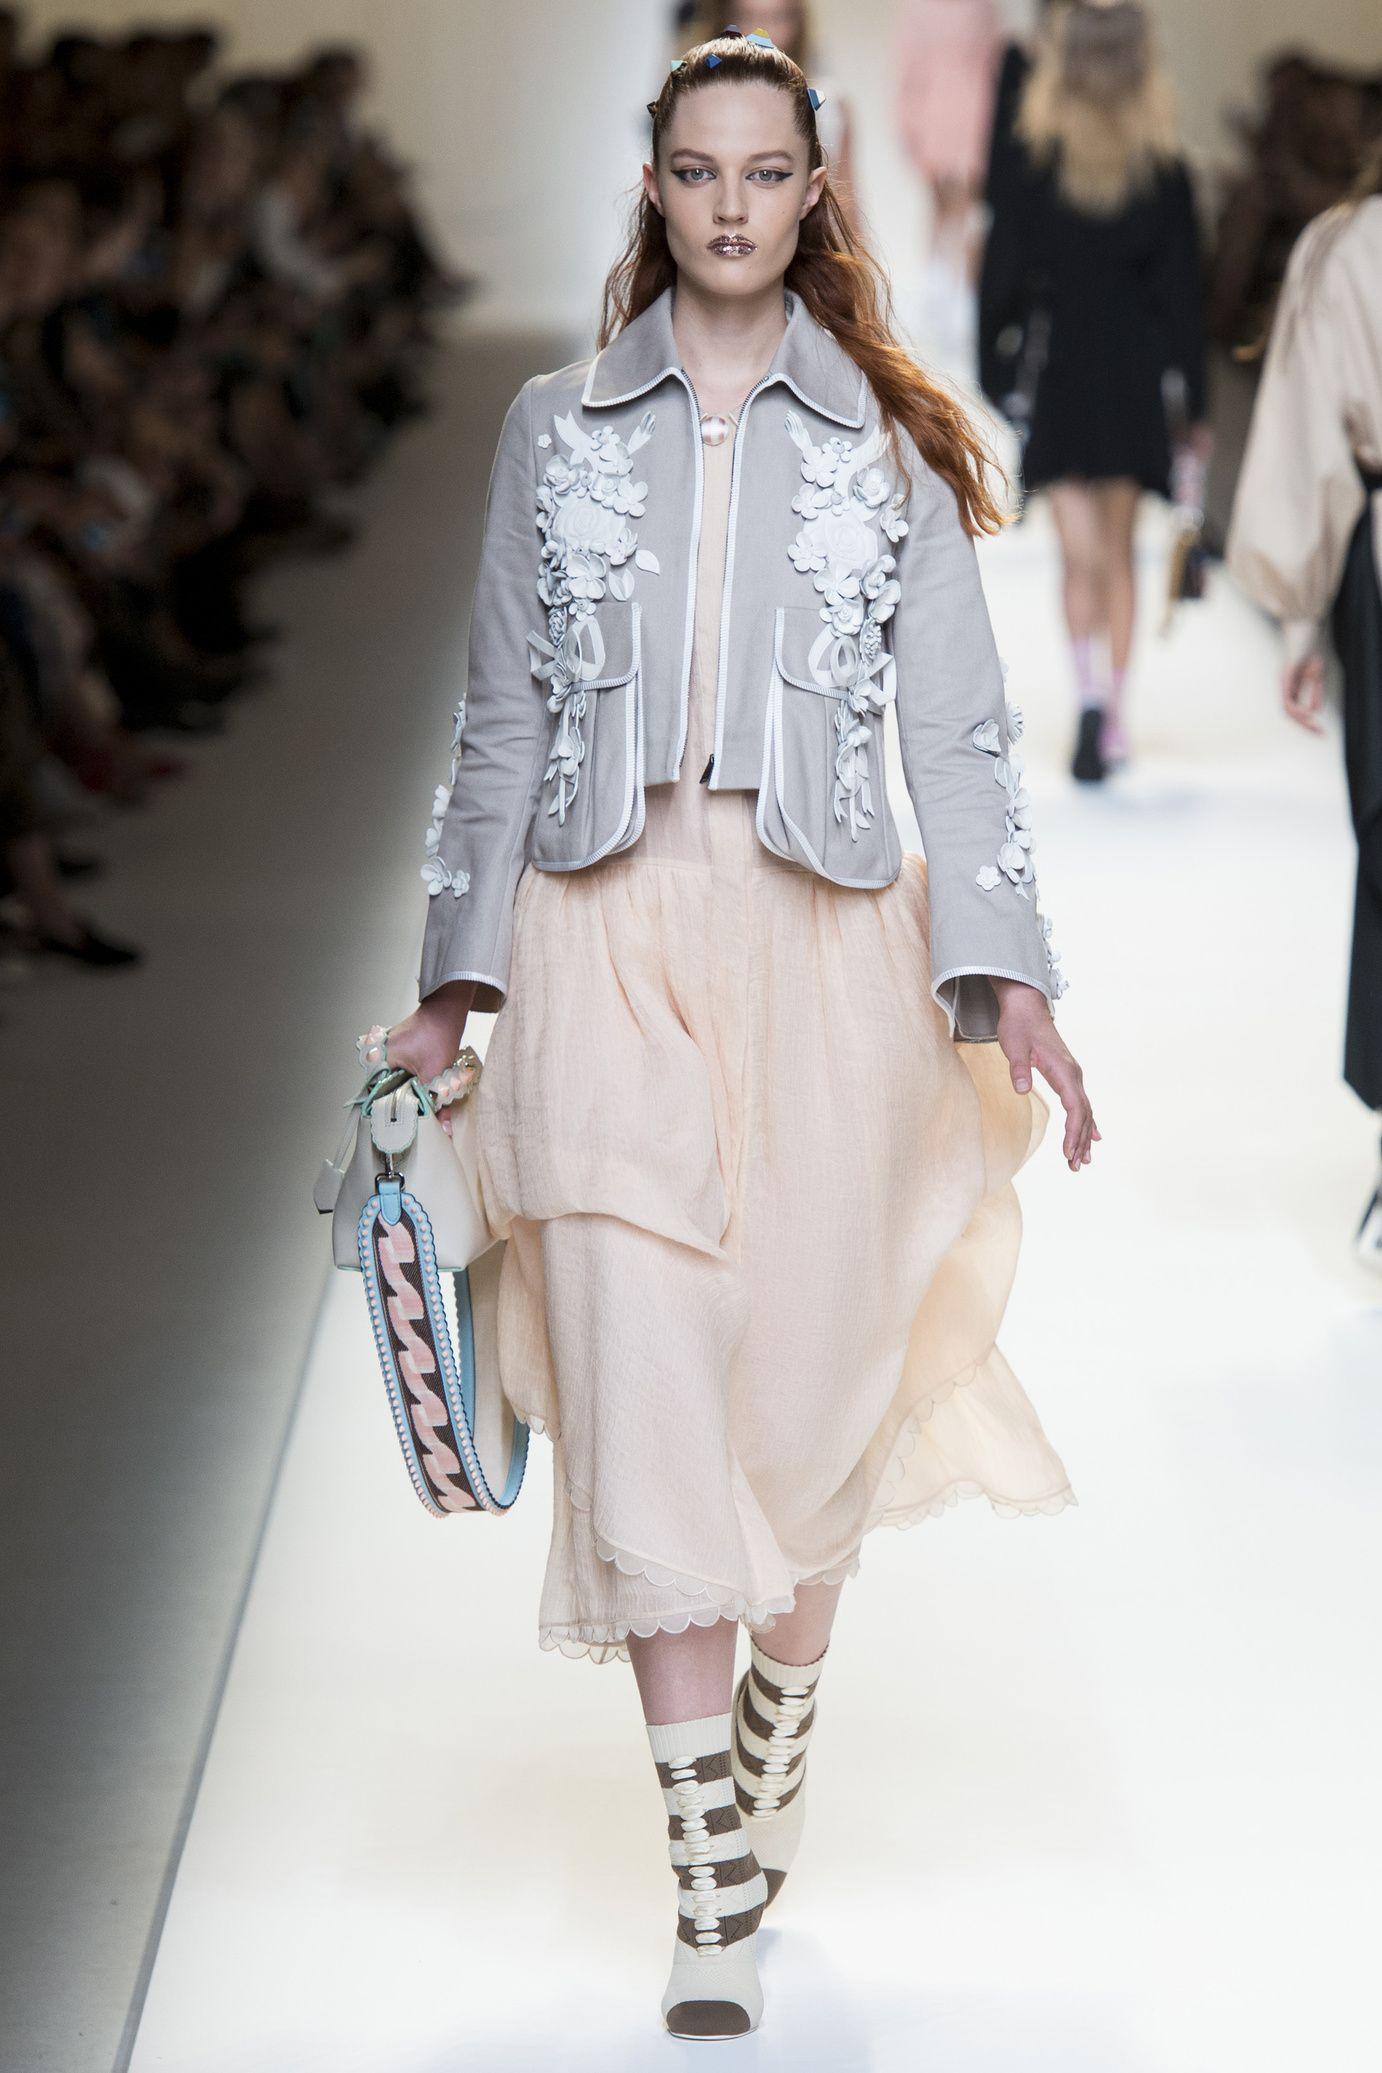 Défilé Fendi  Printemps-été 2017   Pinterest   Fashion 2017, Ss and ... bc2cd546b26